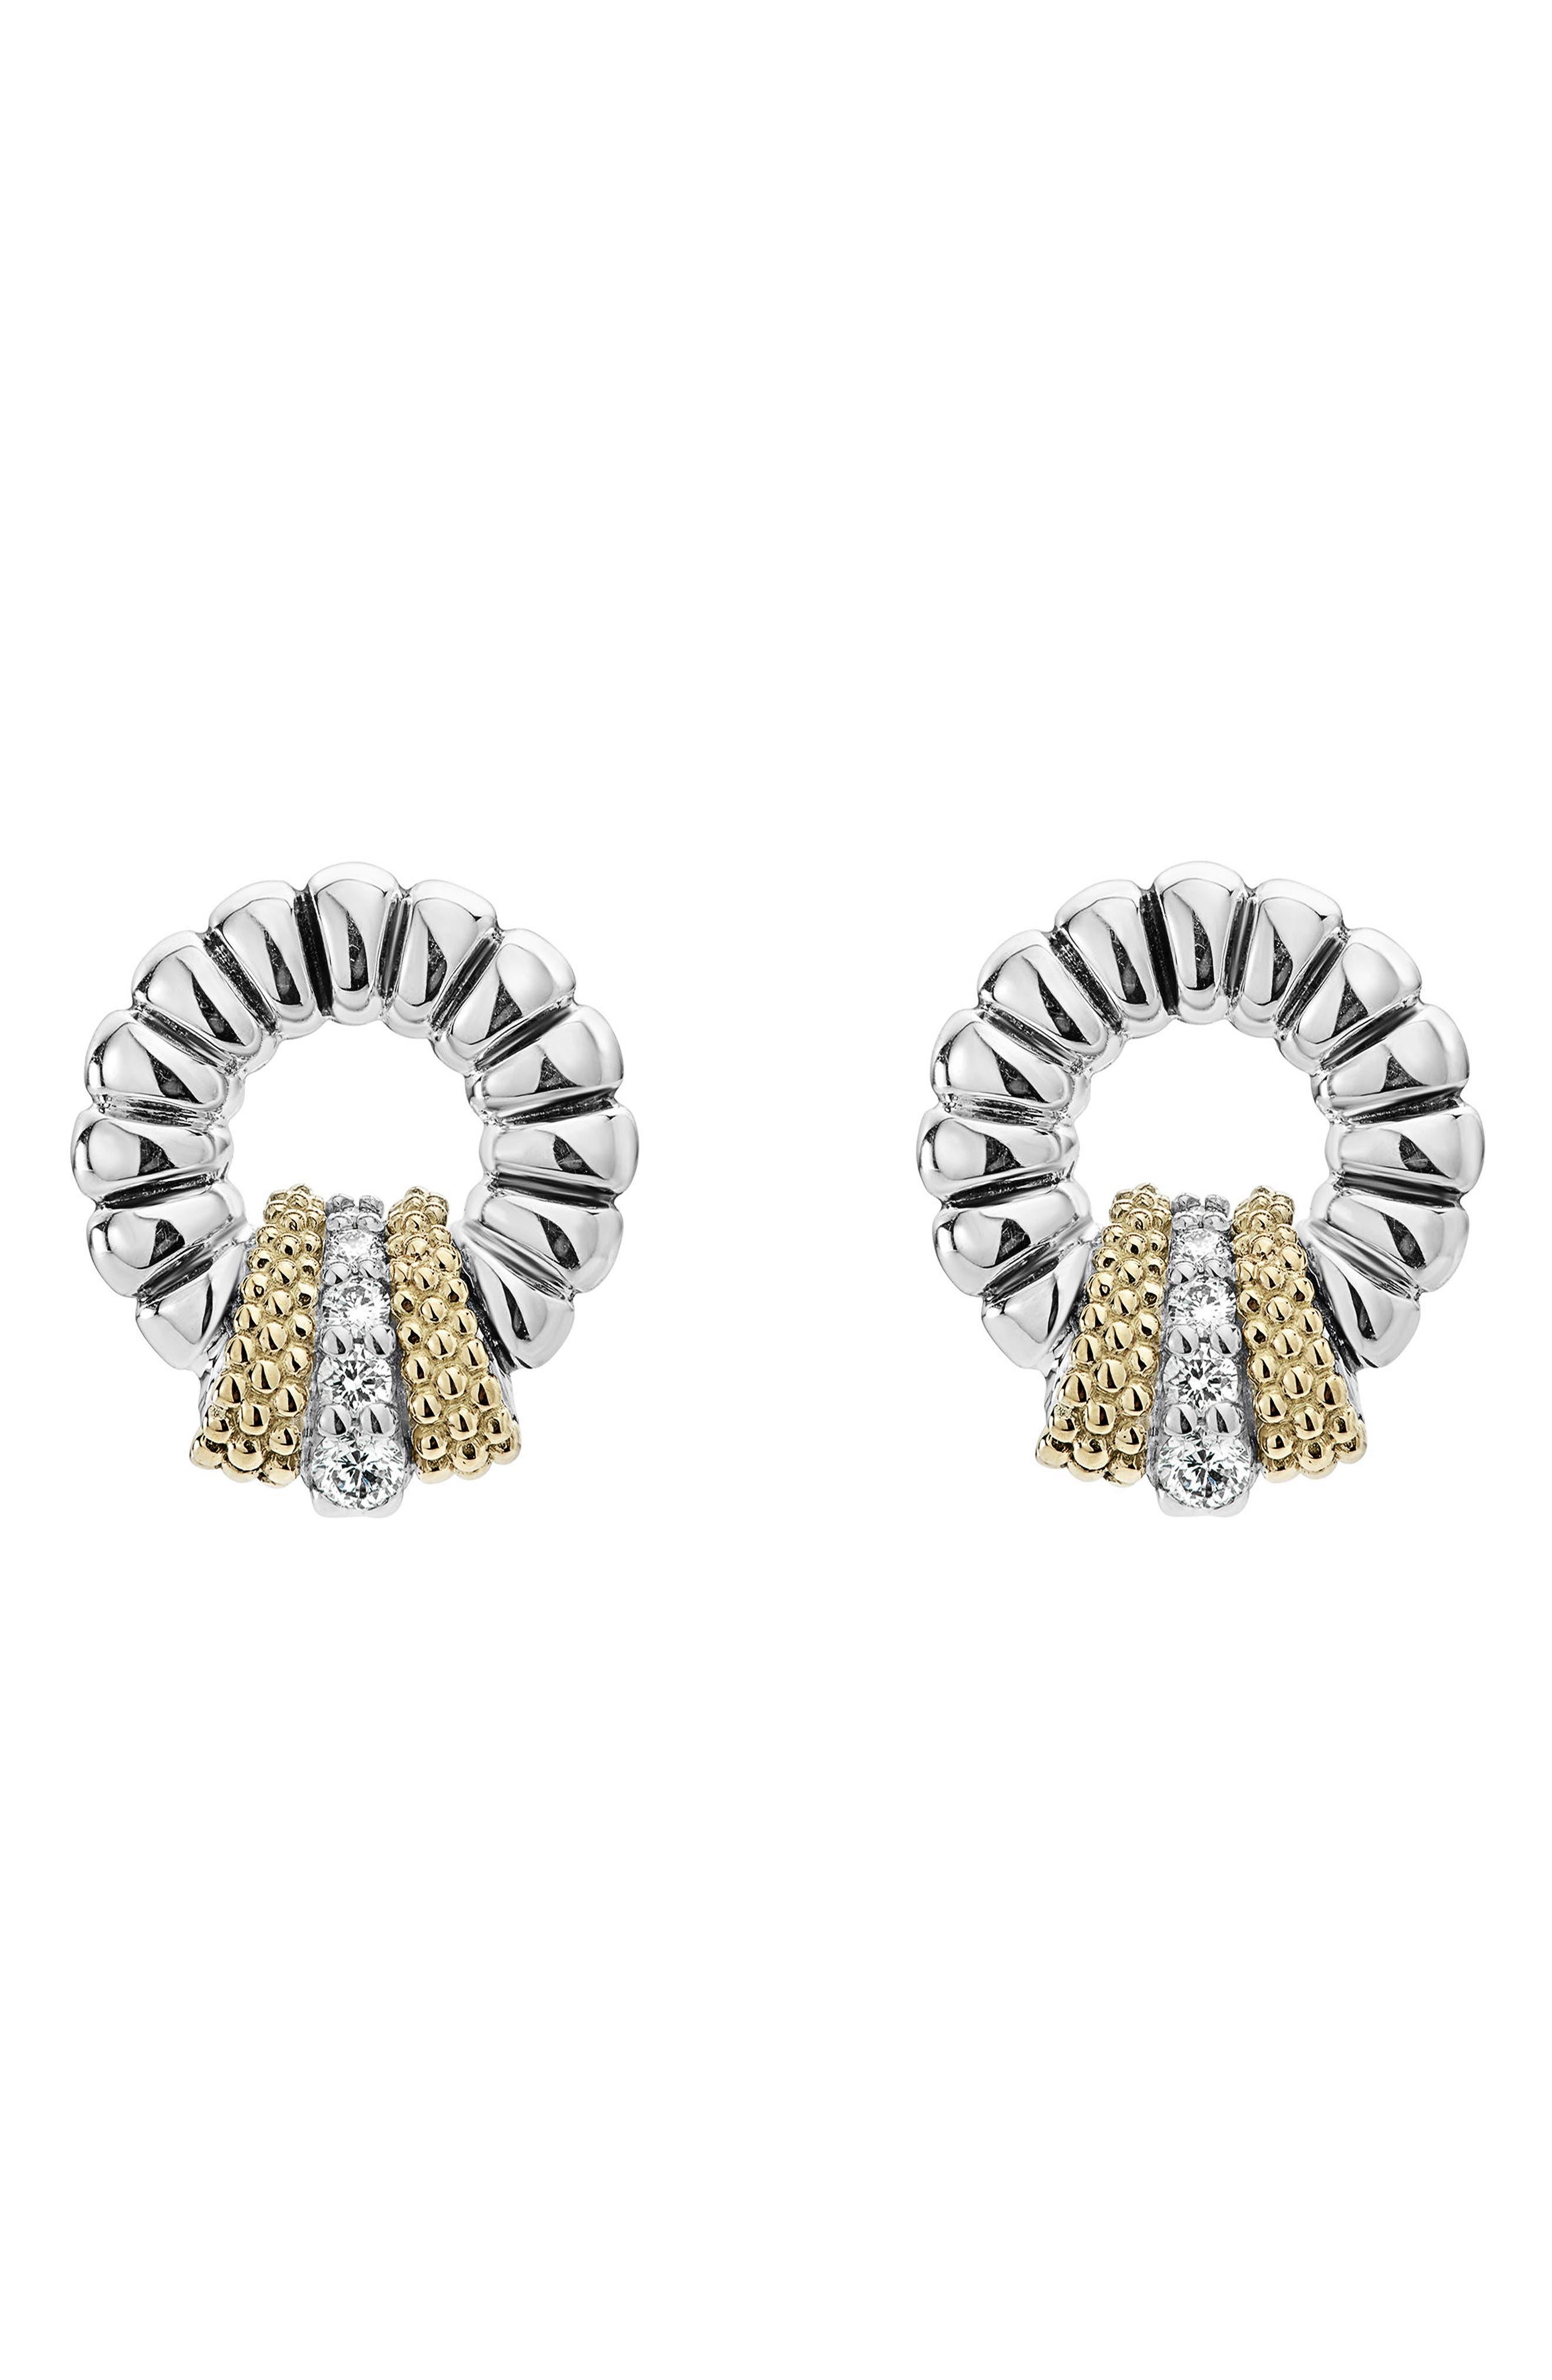 Lux Diamond Stud Earrings,                             Main thumbnail 1, color,                             DIAMOND